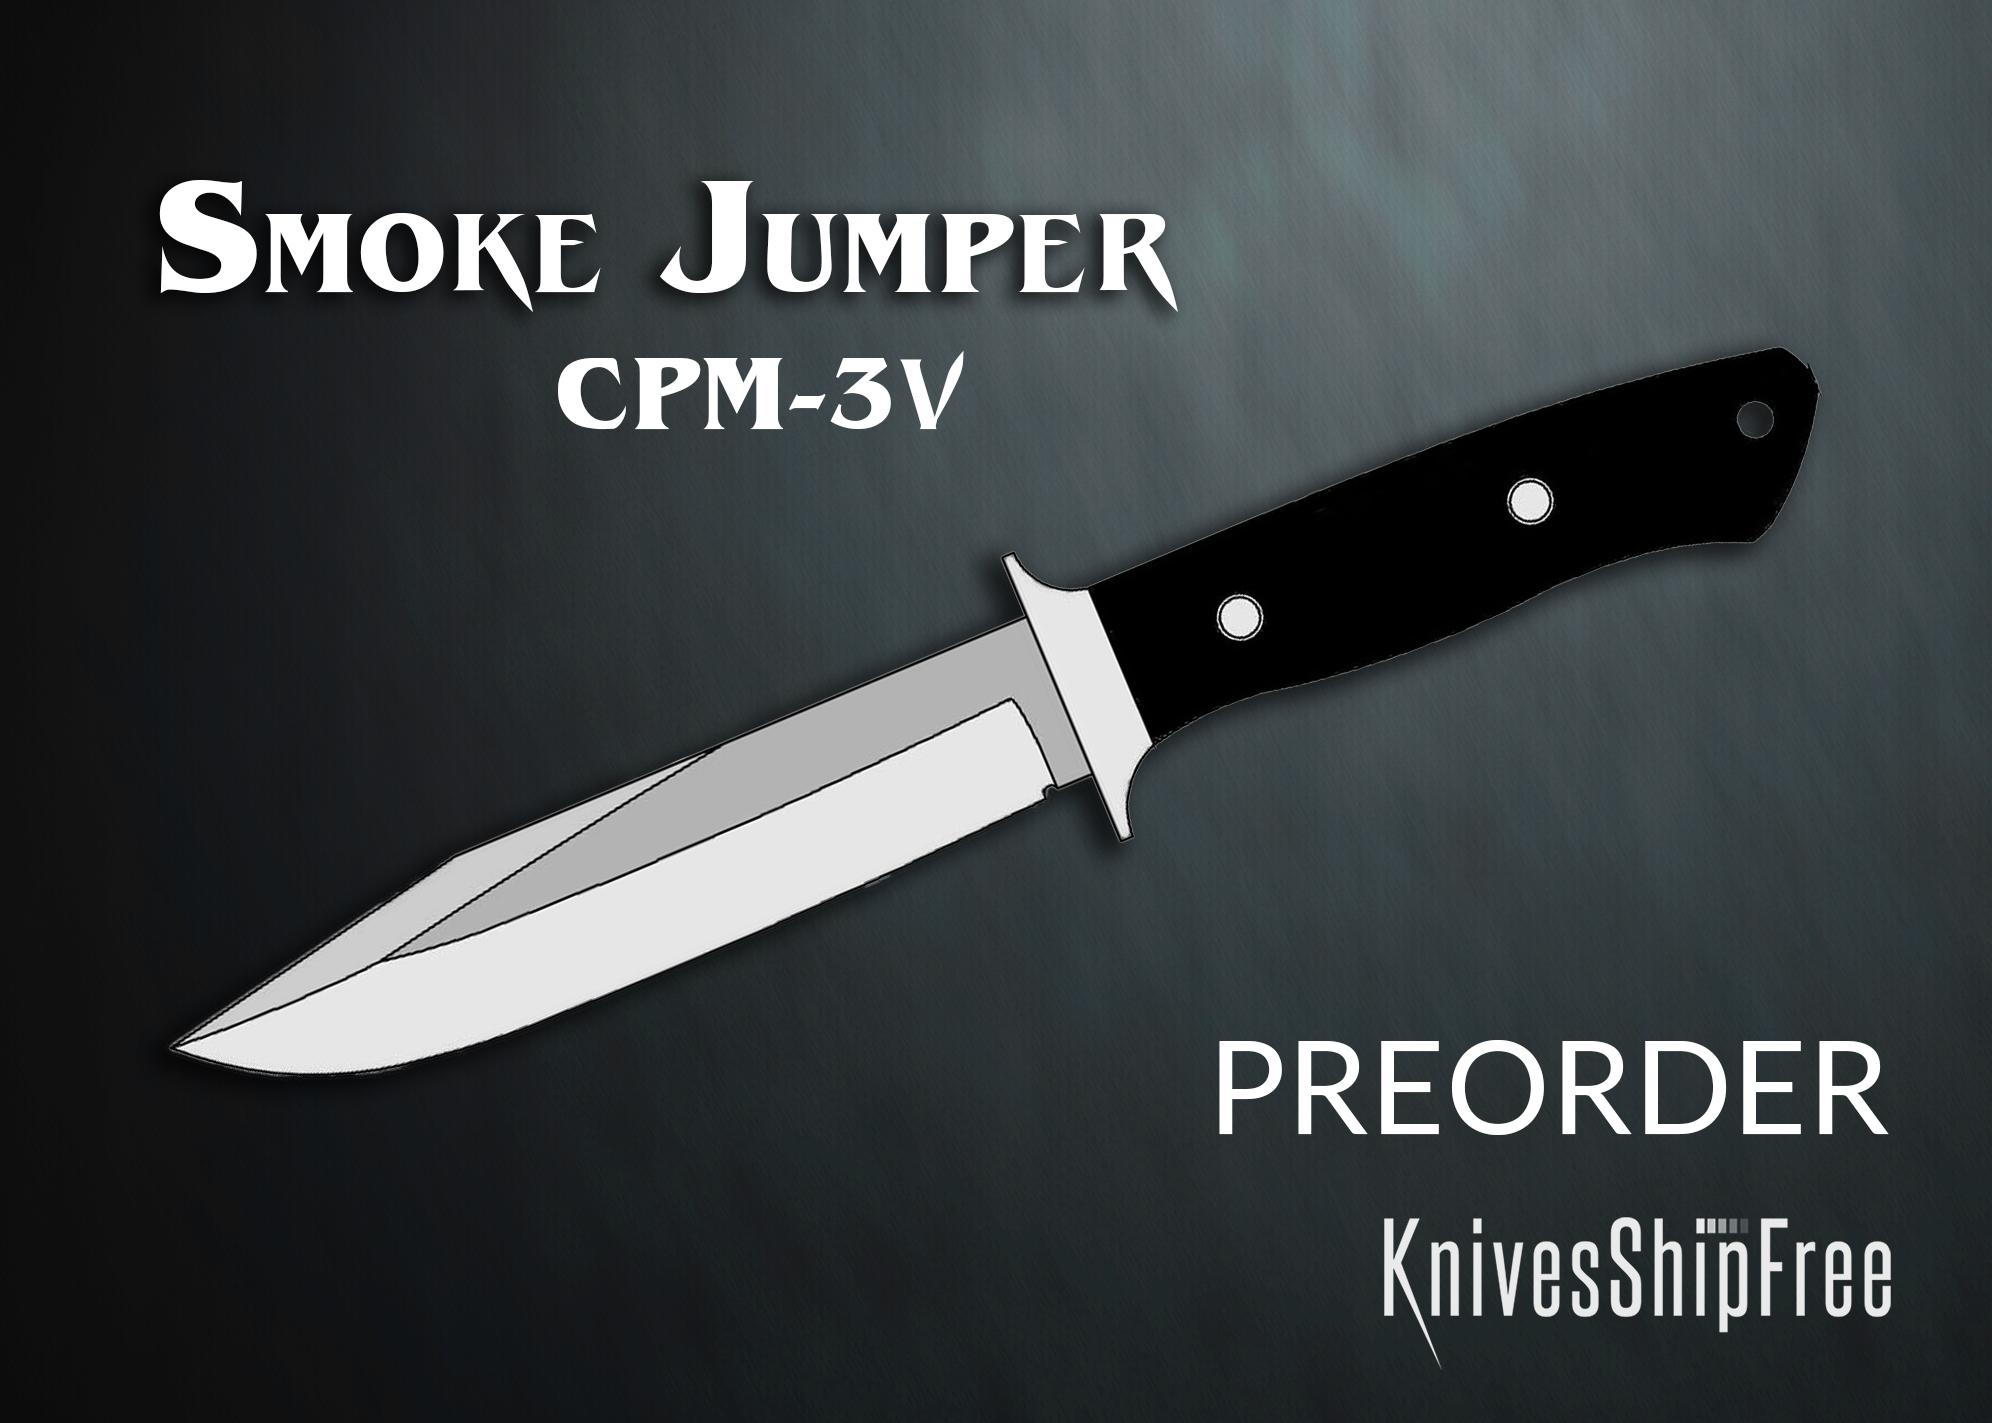 smoke-jumper-preorder.jpg